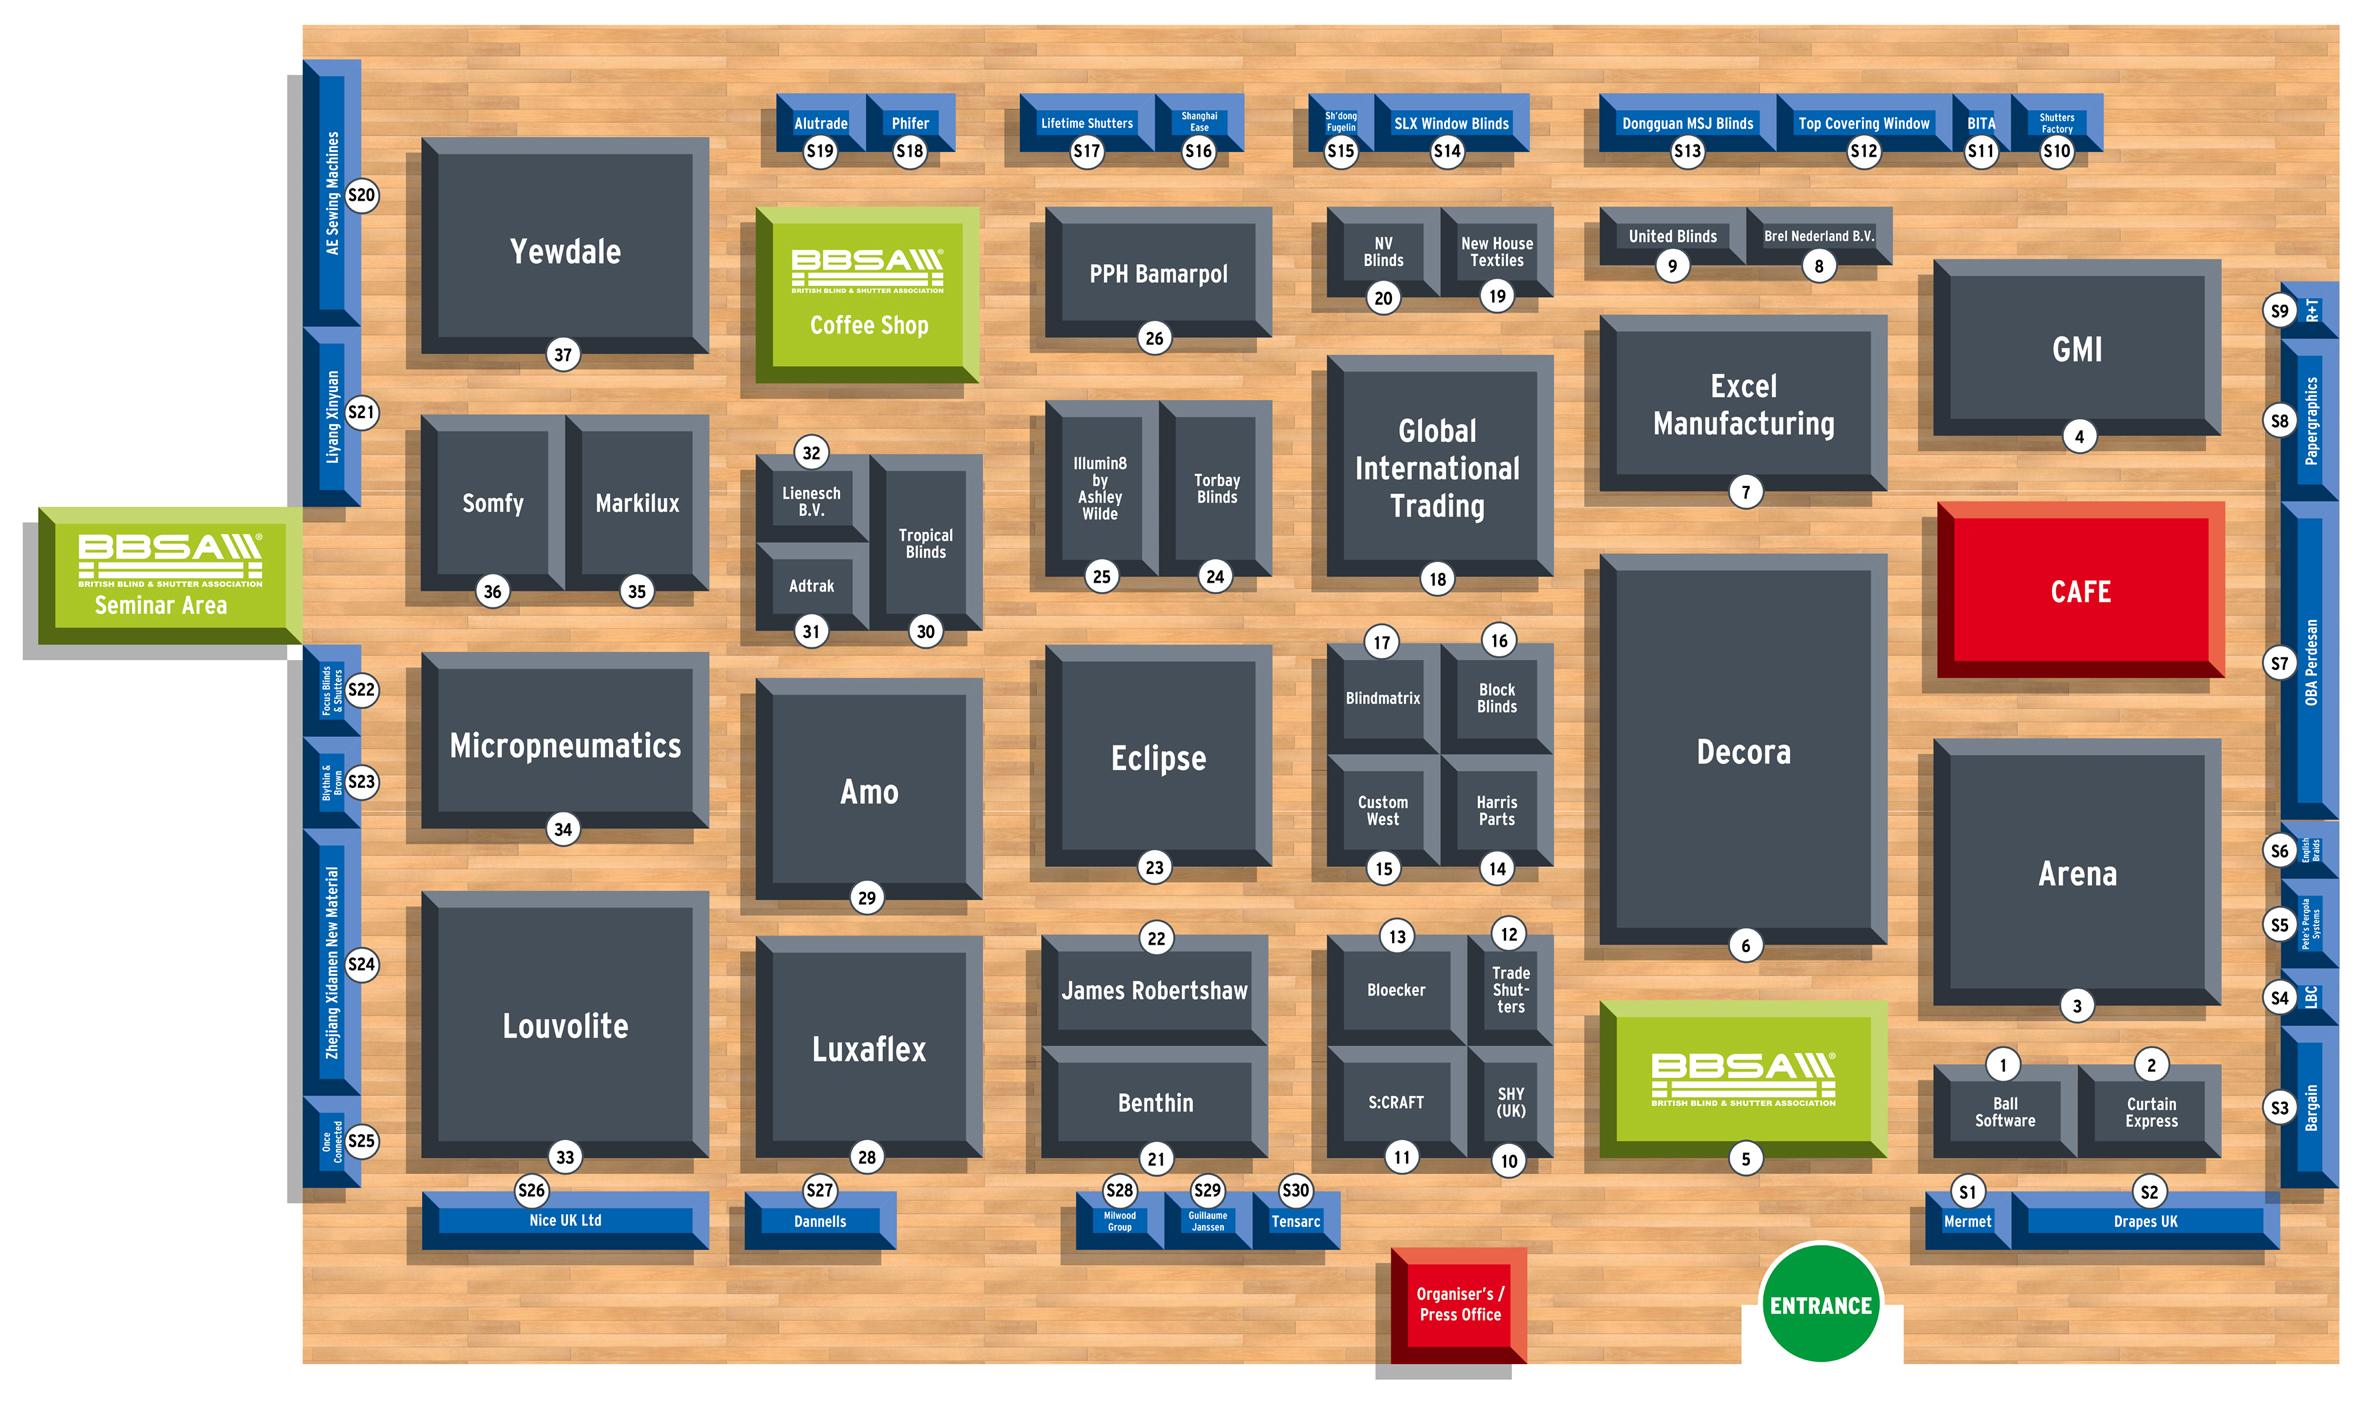 BBSA Show 2018 Floorplan